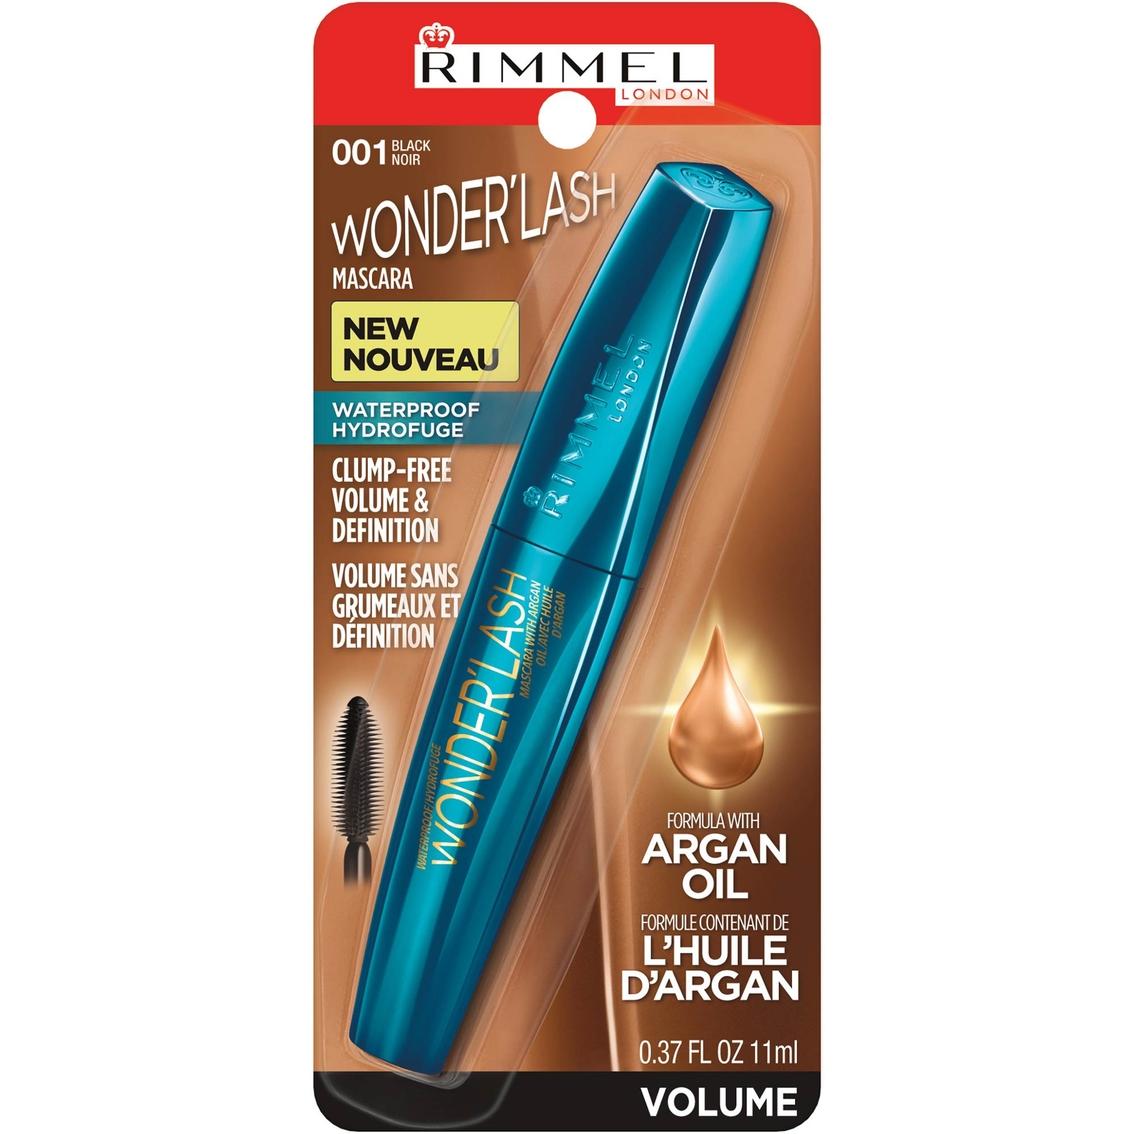 8c76ea70fdb Rimmel Wonder'lash Waterproof Mascara With Argan Oil | Mascara ...